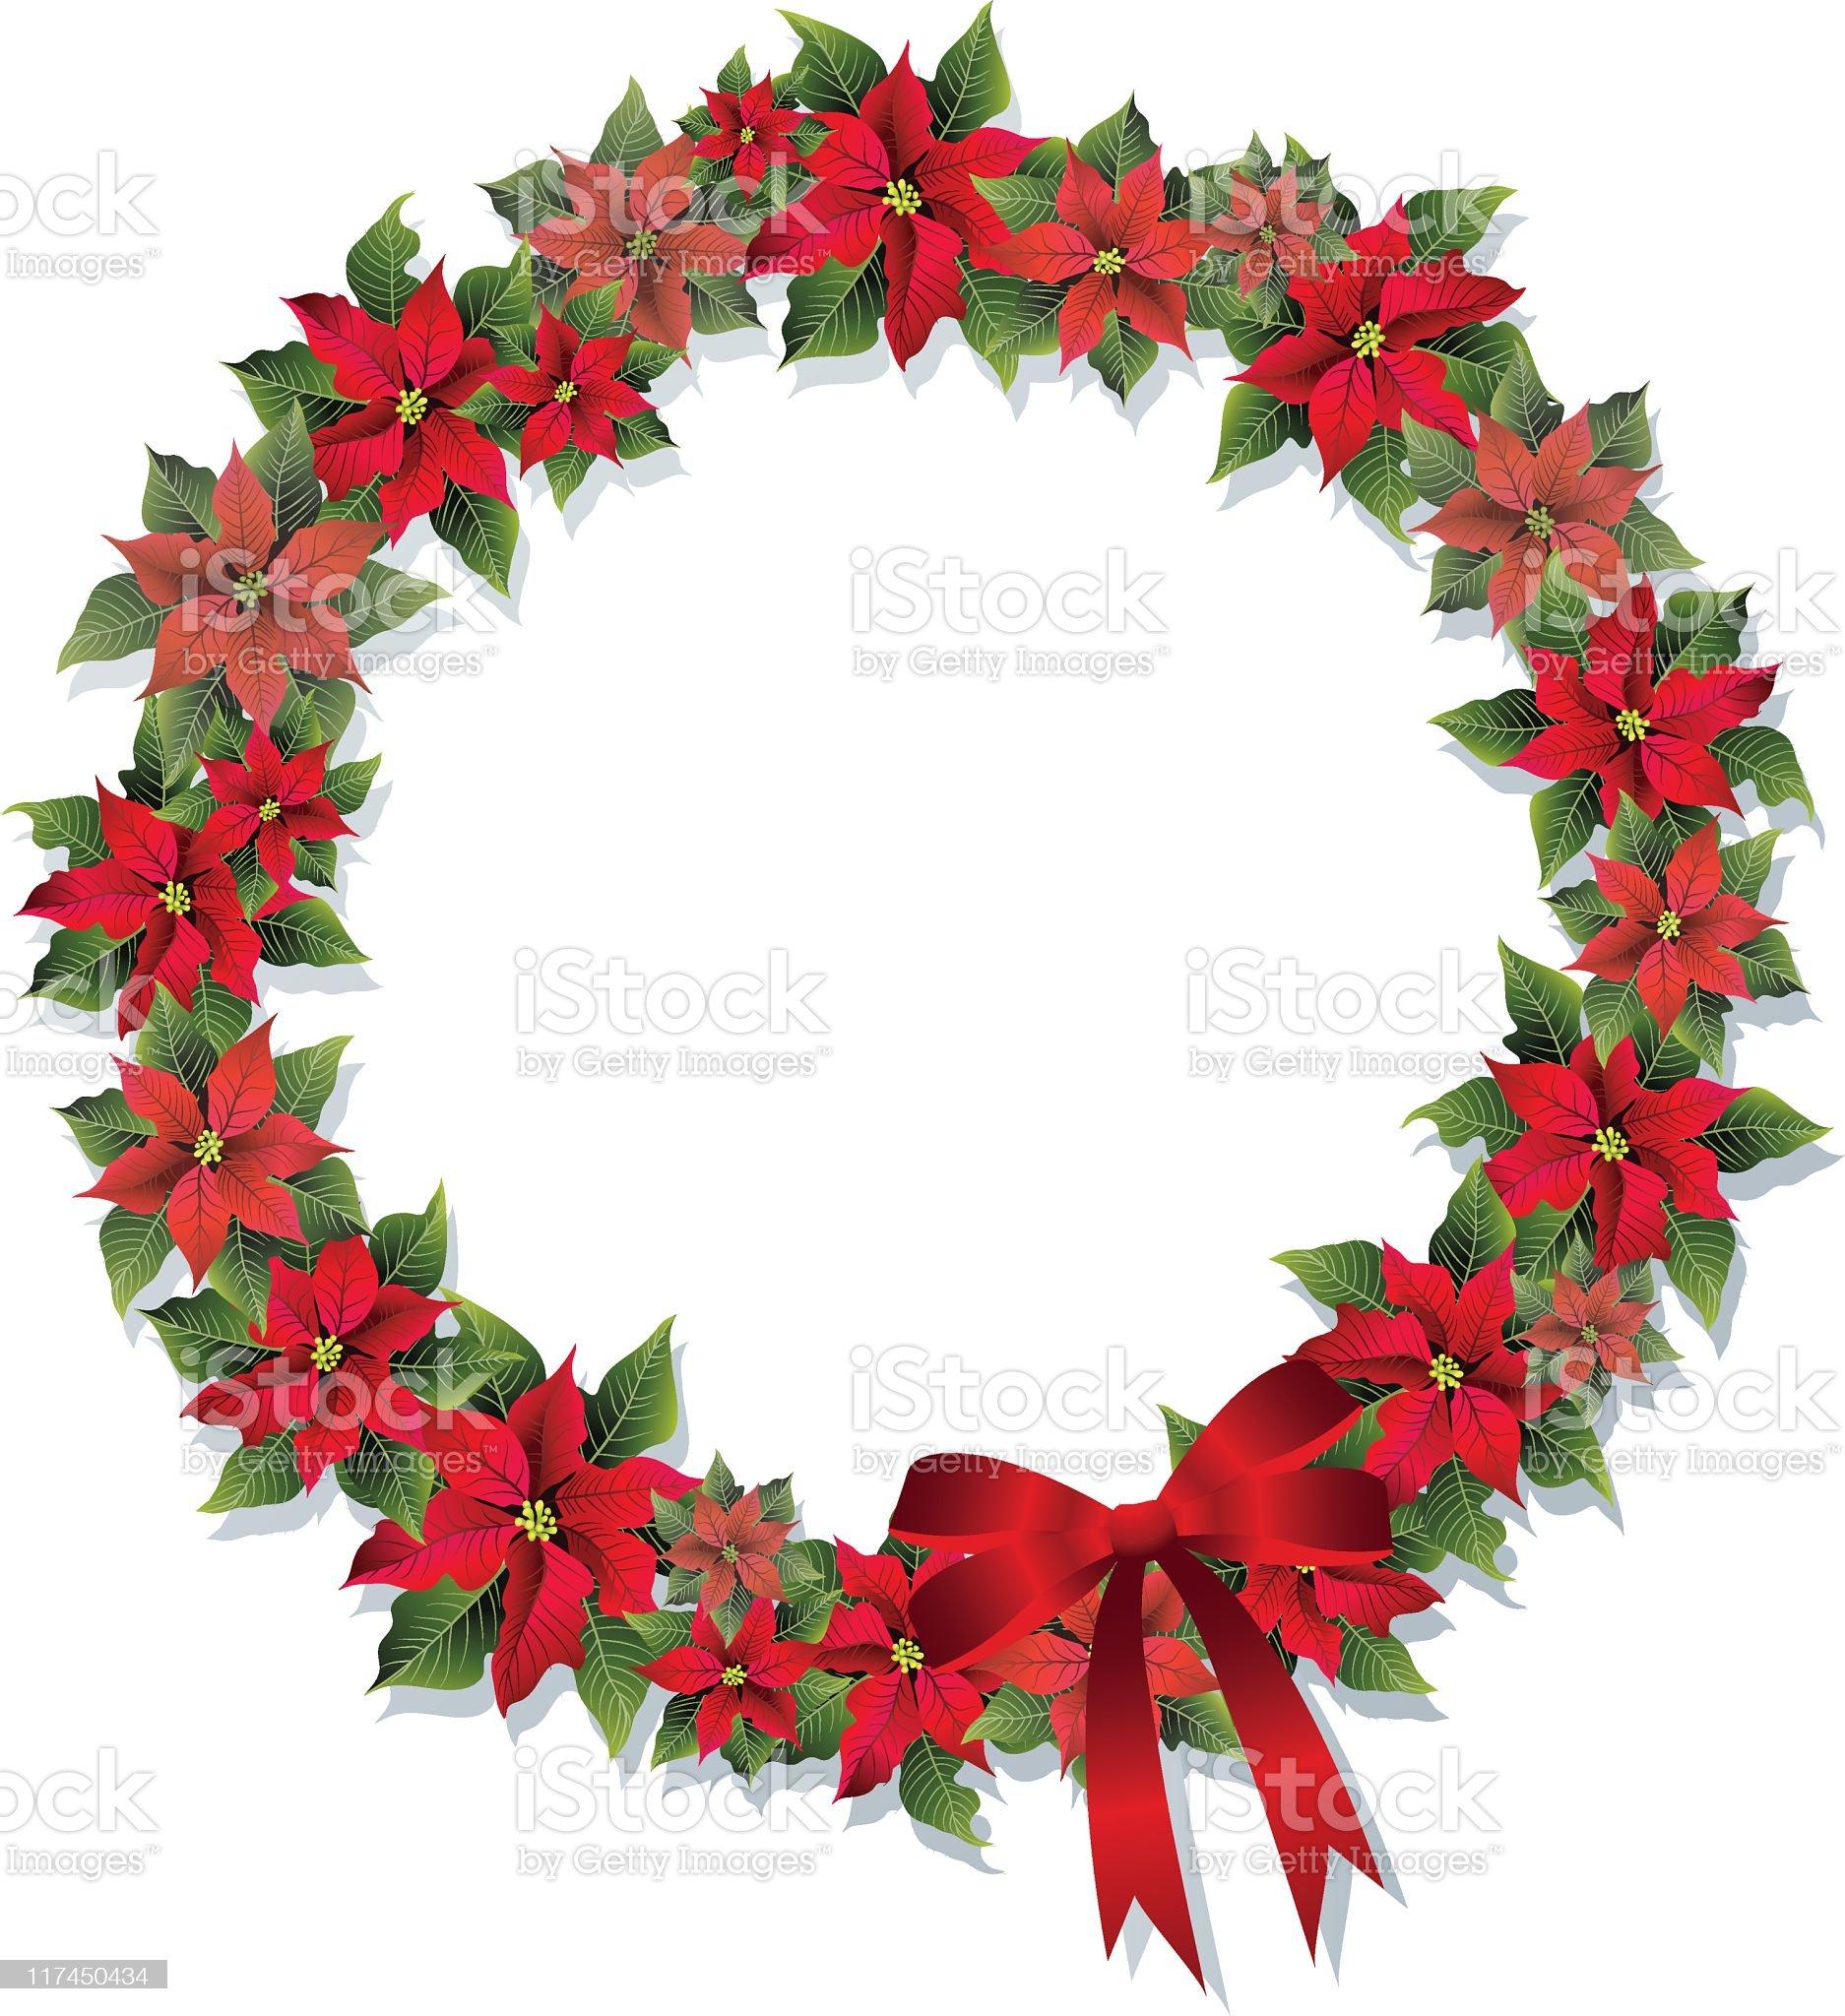 Poinsettia Wreath royalty-free stock vector art